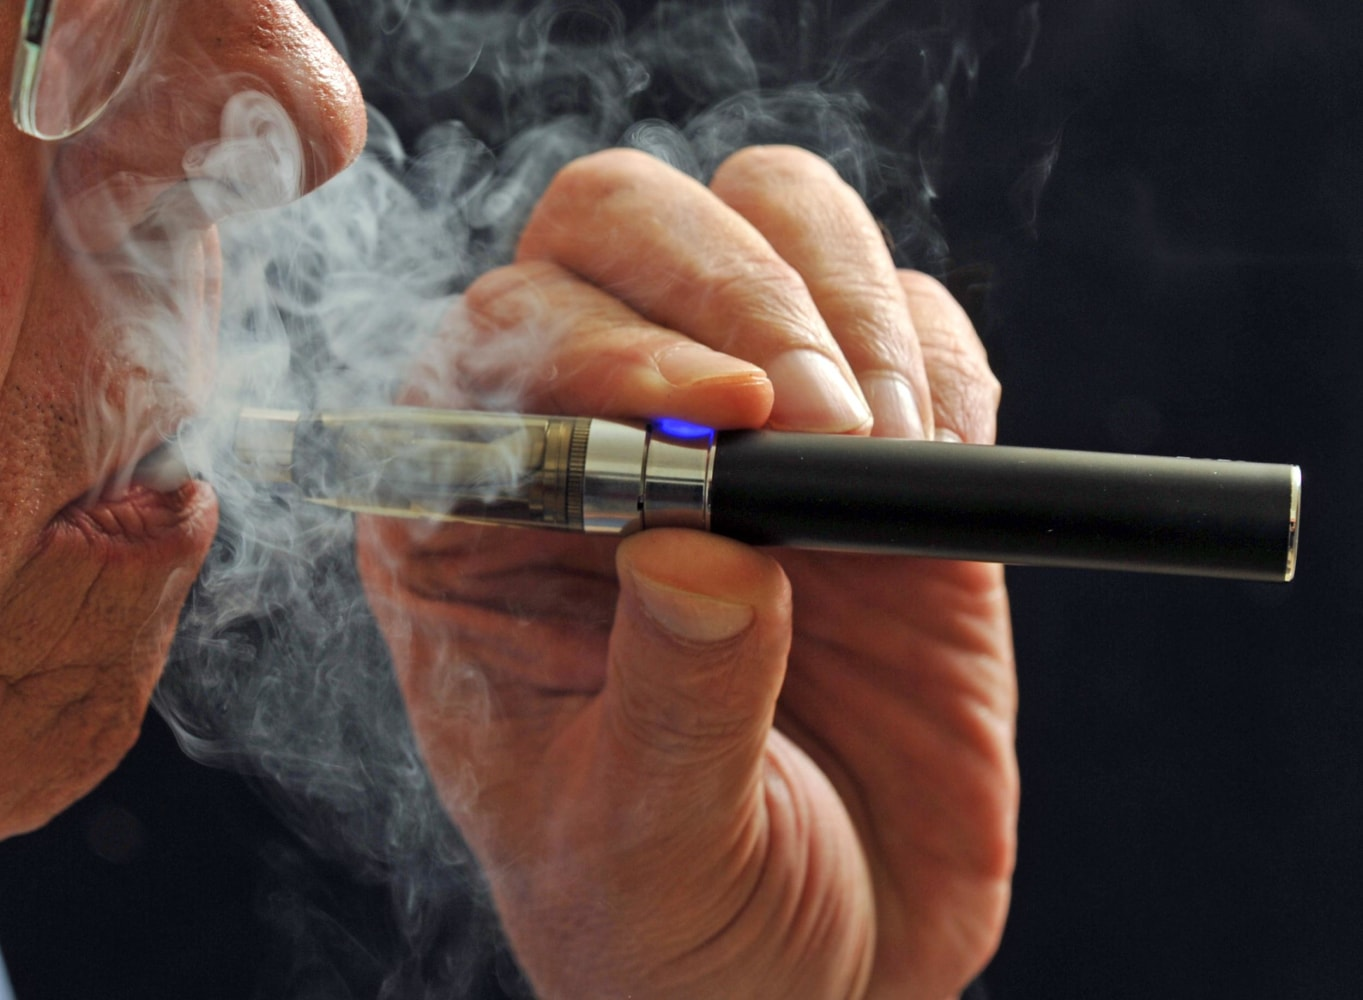 Njoy electronic cigarette 7 eleven